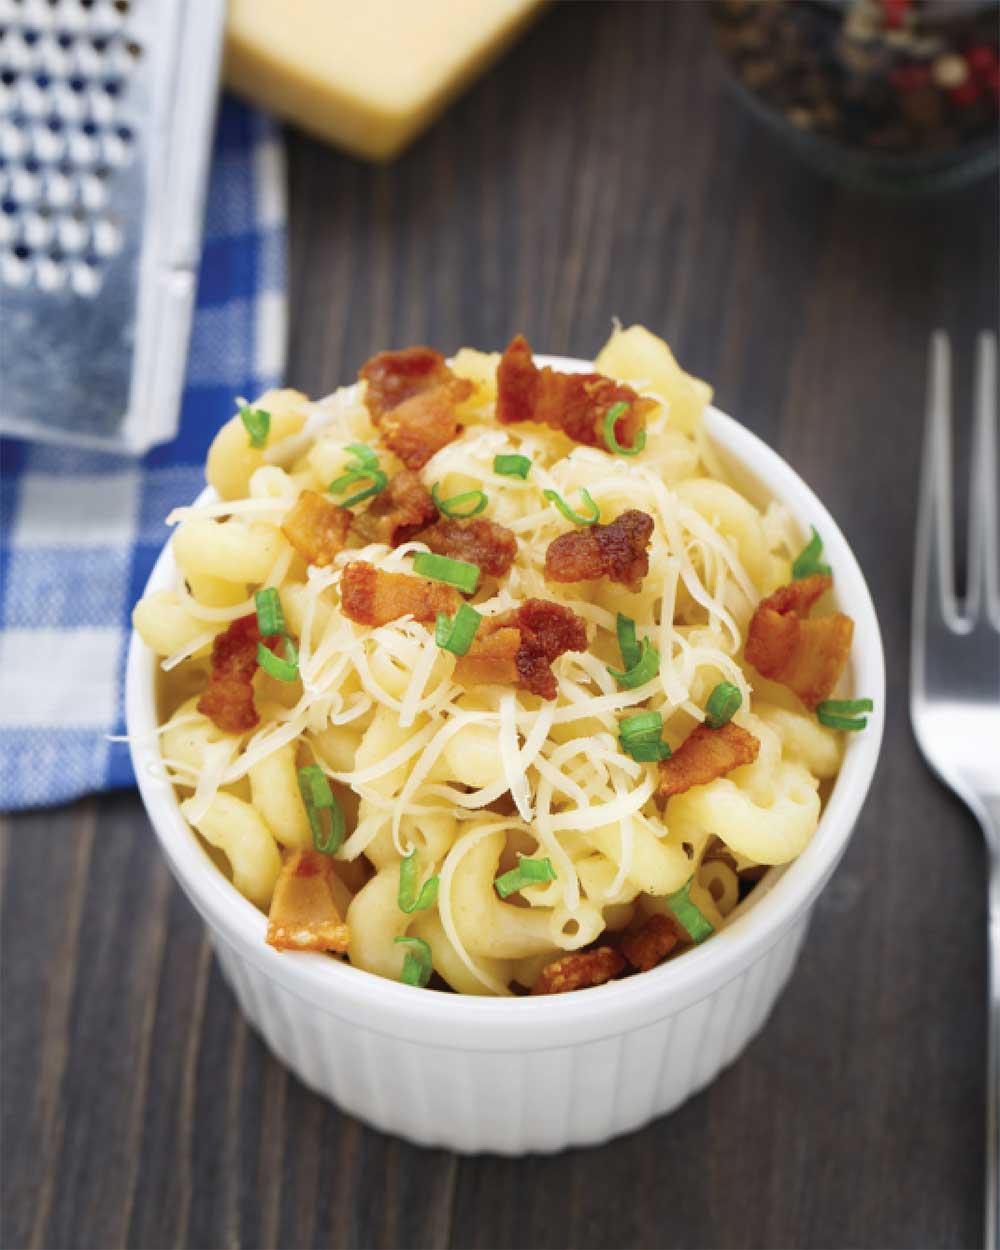 Creamy Macaroni & Cheese with Crispy Bacon